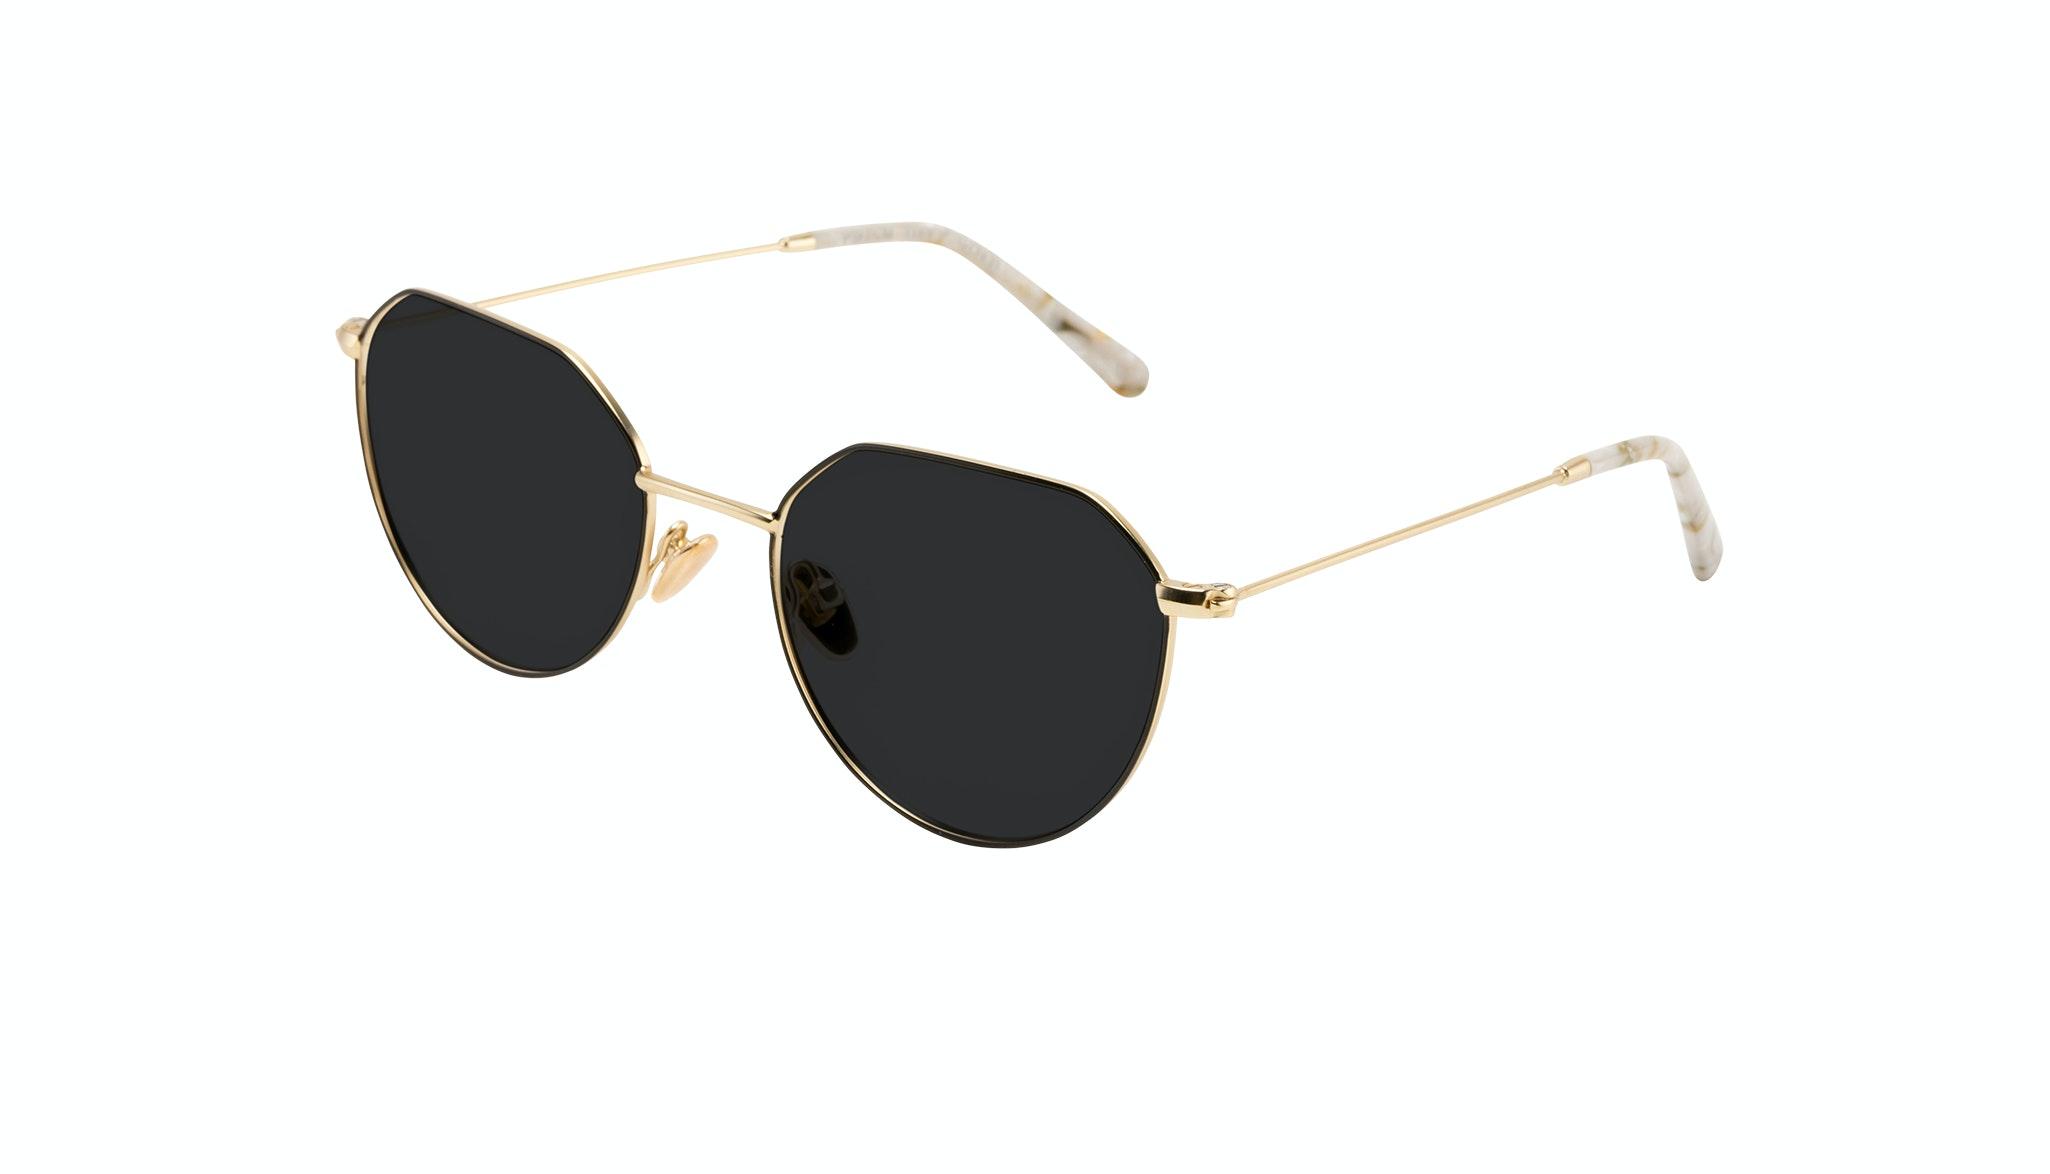 Affordable Fashion Glasses Round Sunglasses Women Prism Deep Gold Tilt